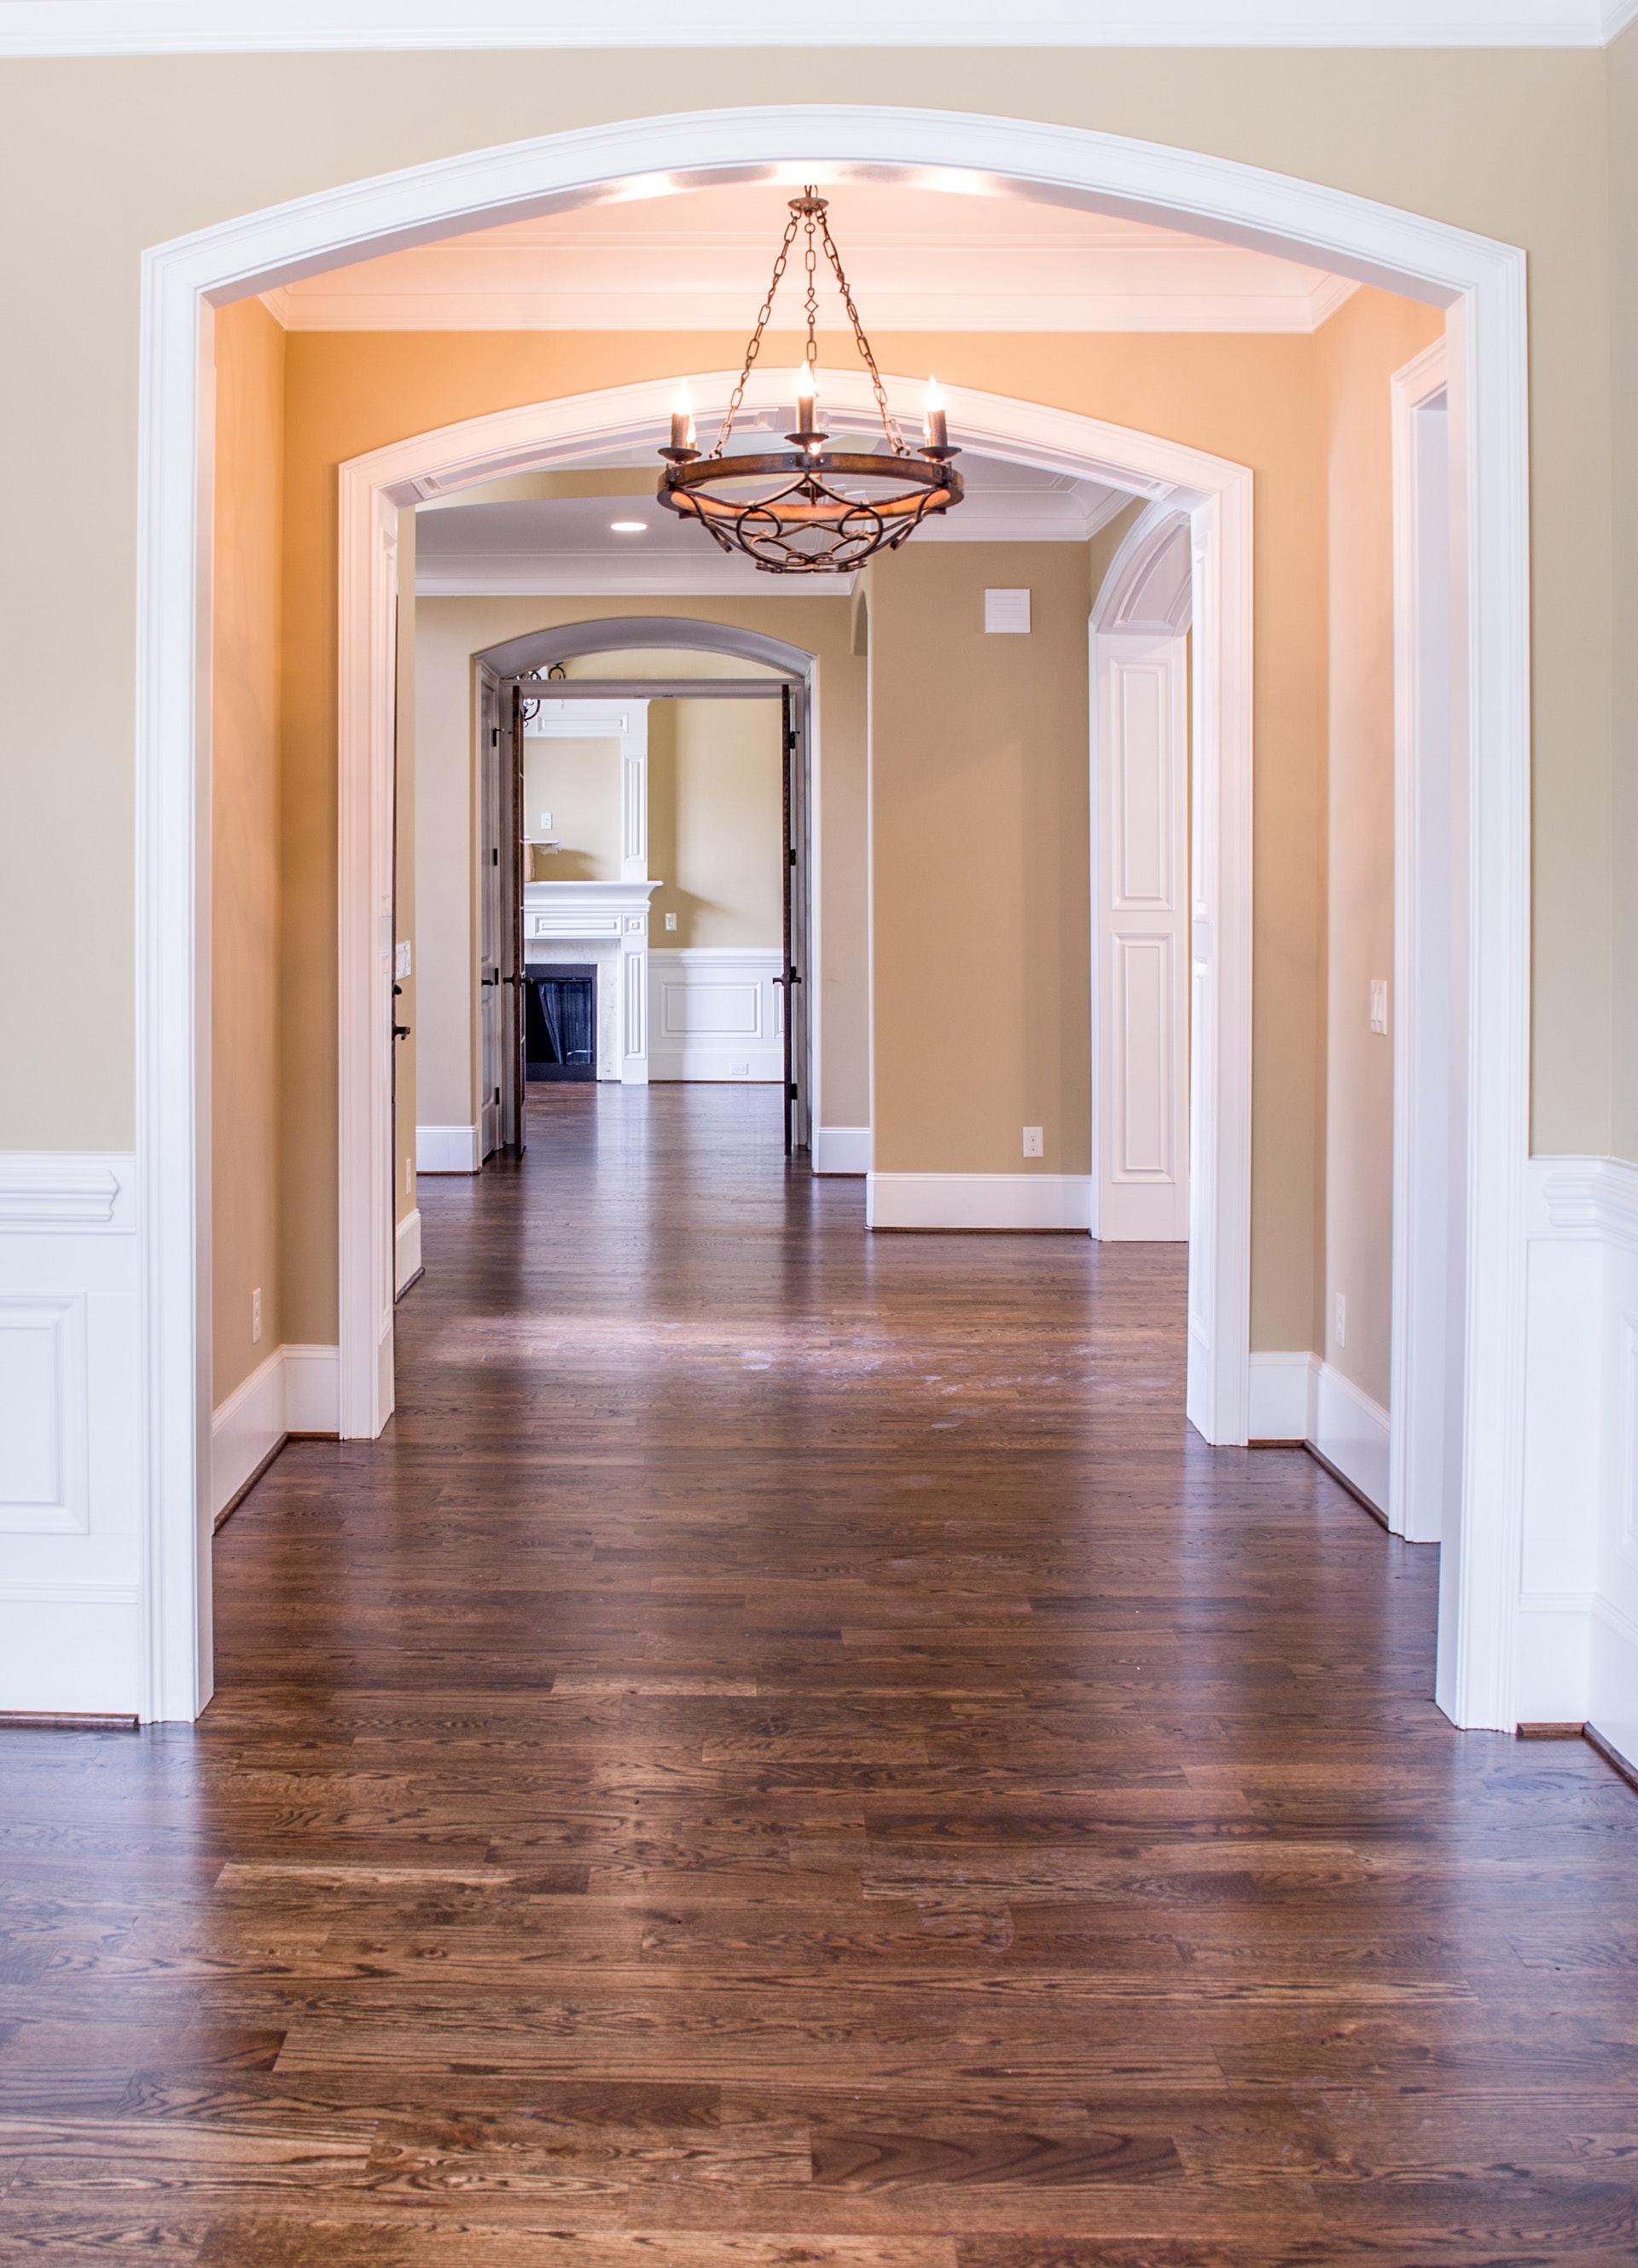 Imhoff Hallway